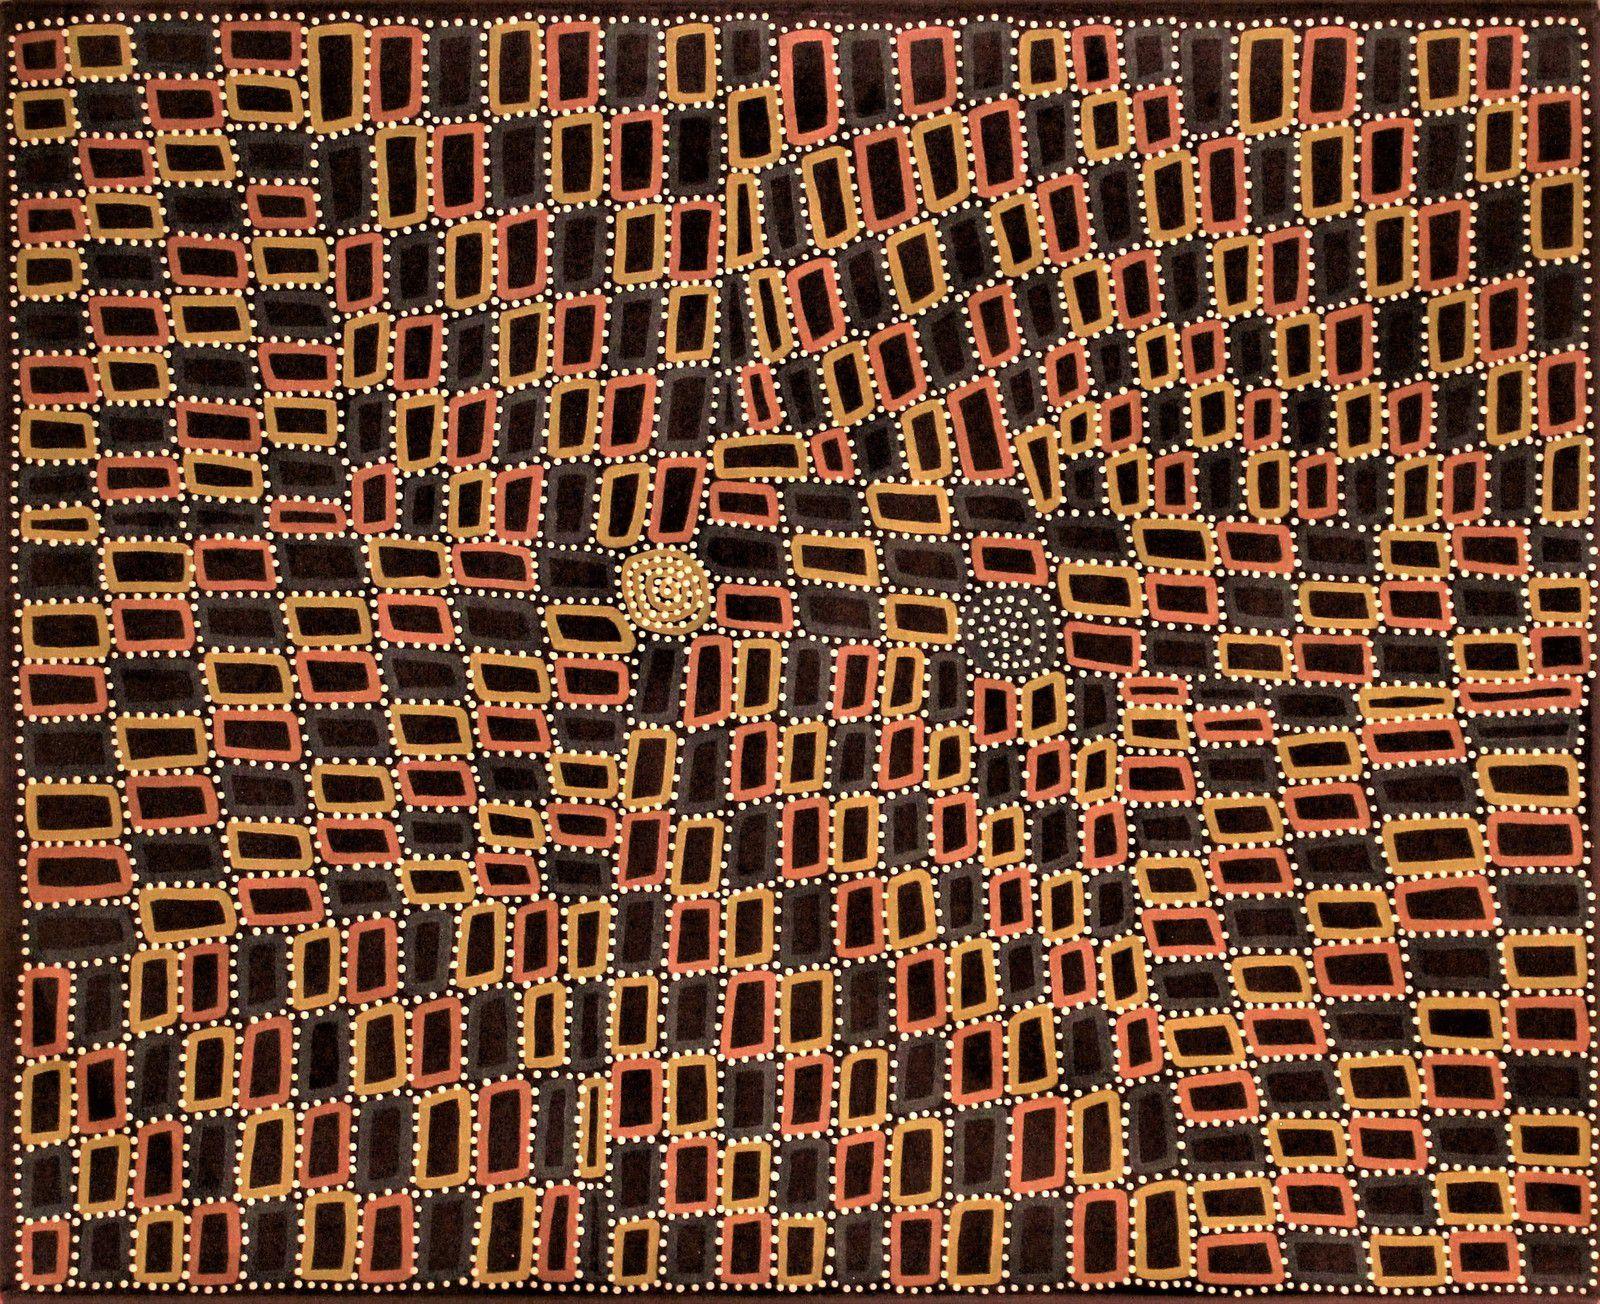 Peinture aborigène du désert